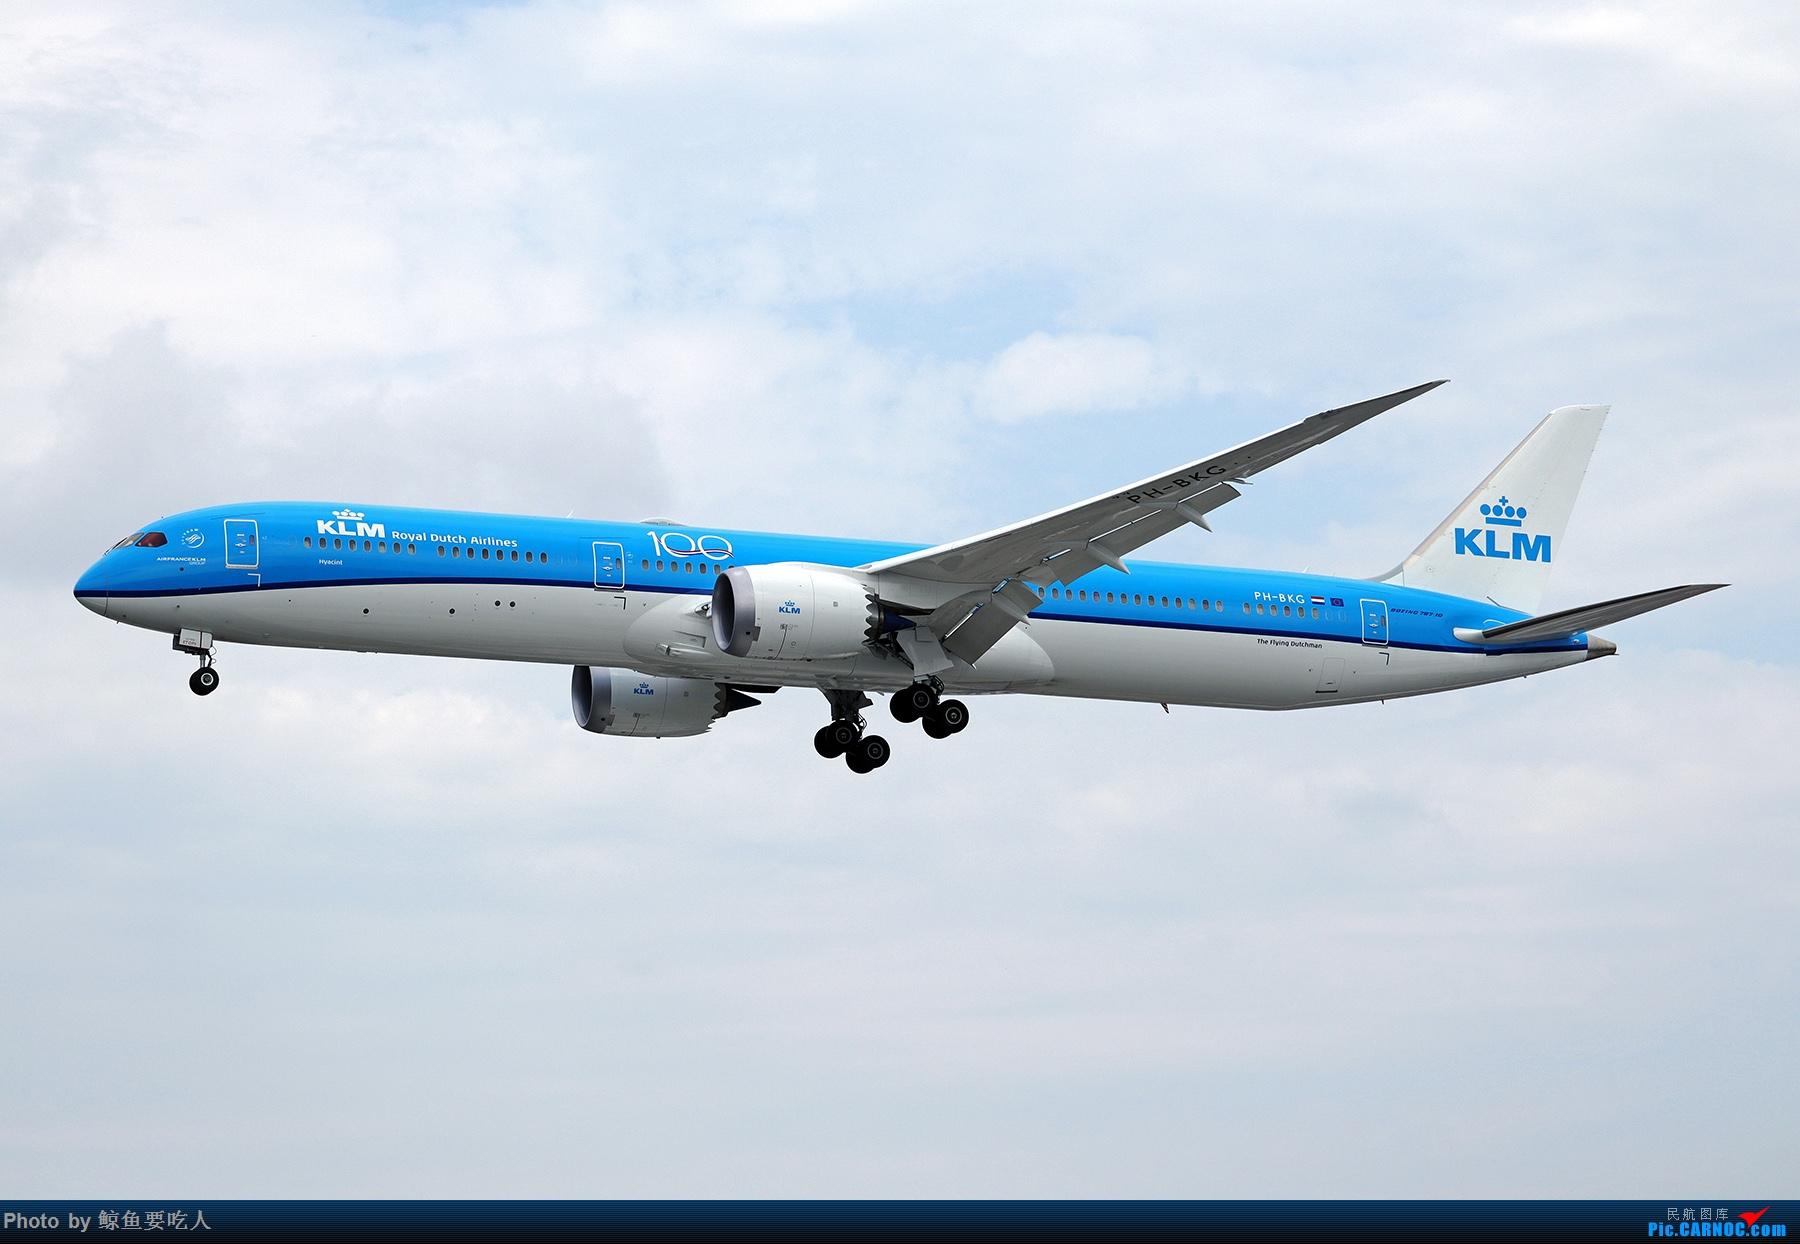 Re:[原创]【多图党】见证疫情后逐步的恢复,加拿大夏日多伦多皮尔逊机场拍机~ 乐见诸航空公司复航多伦多 BOEING 787 PH-BKG 多伦多皮尔逊国际机场